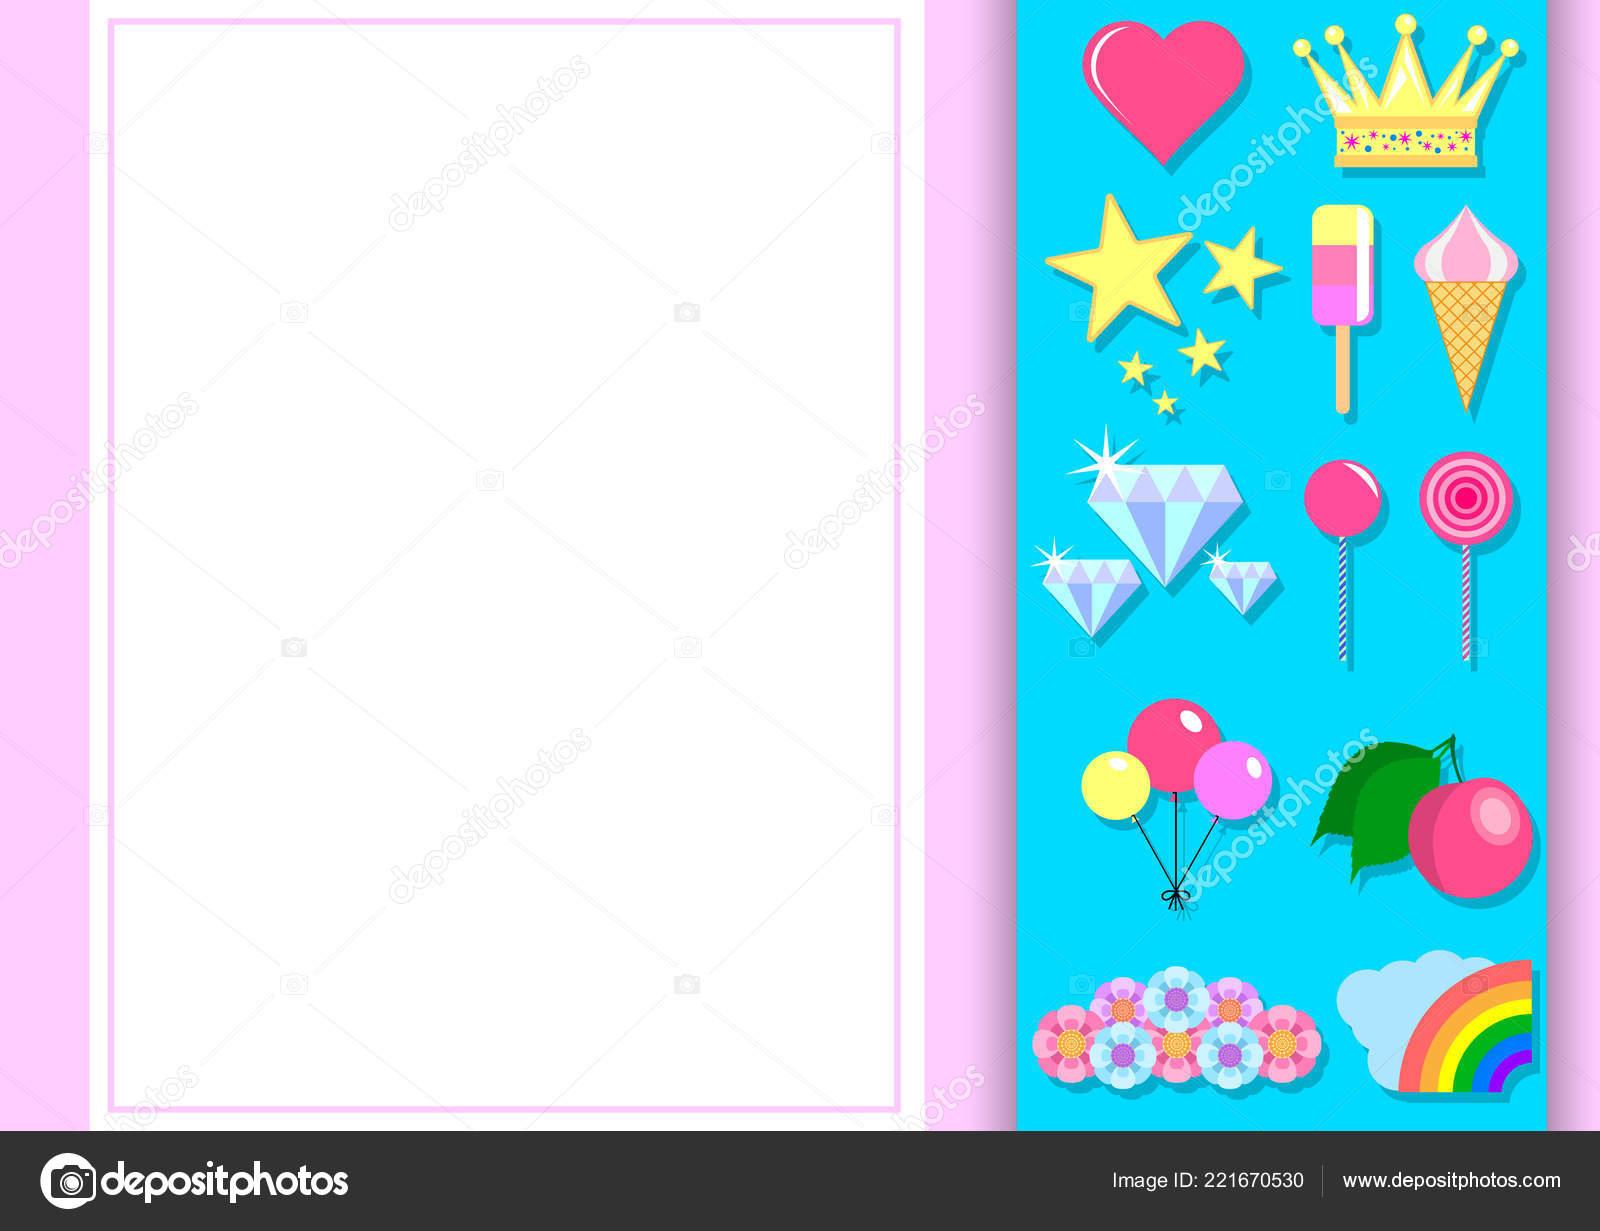 Typographic Design For Greeting Birthday Invitation Card